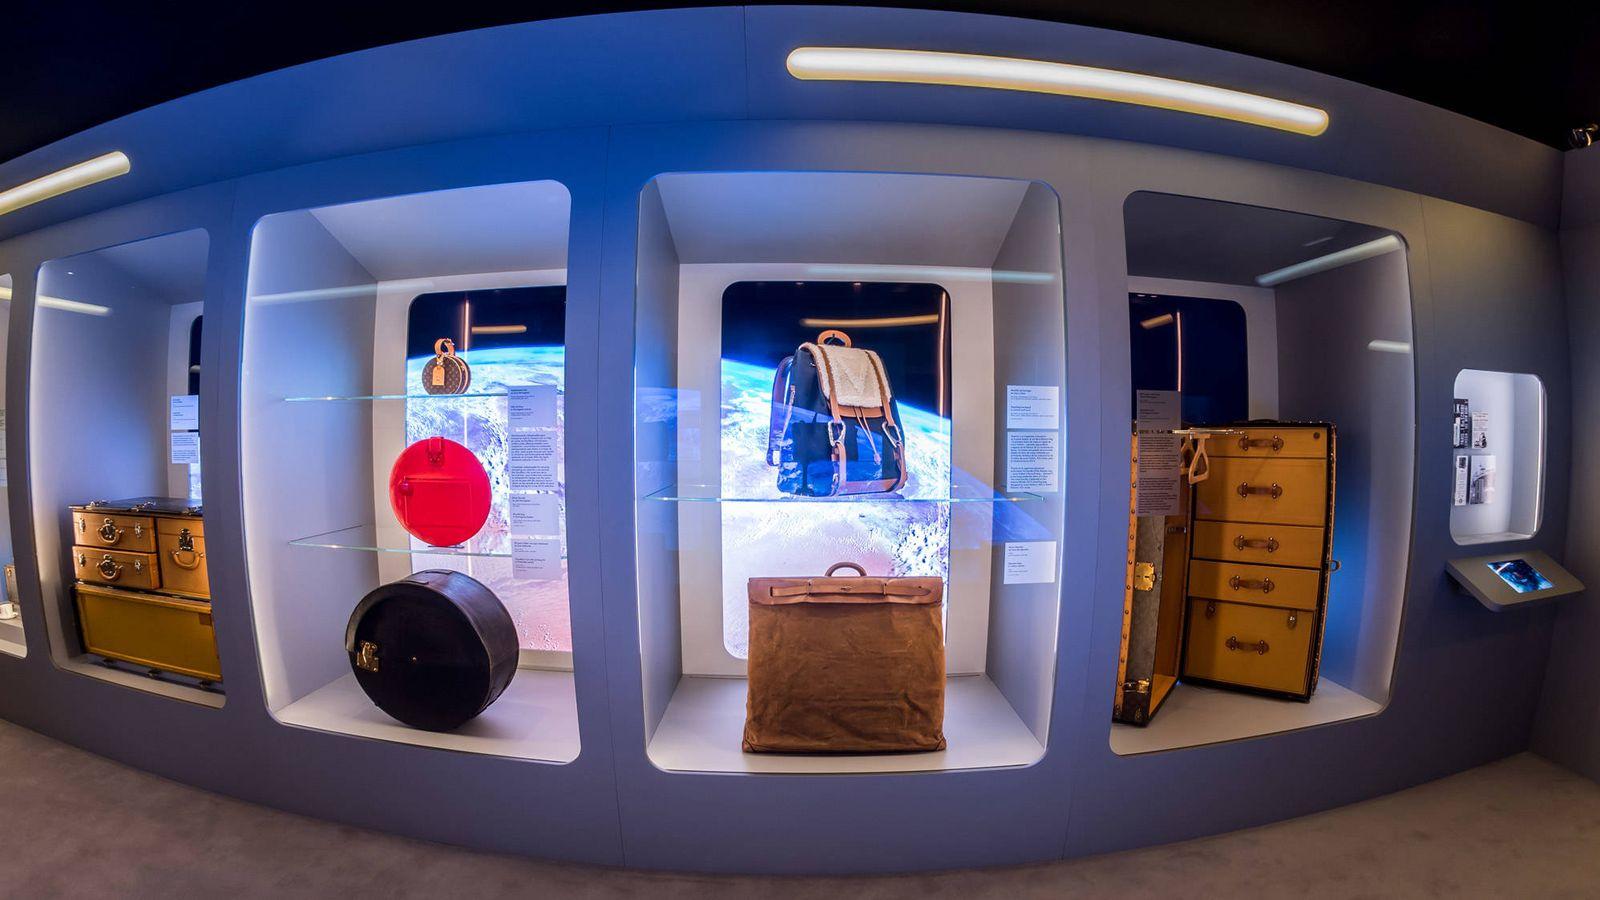 928aa3faf Lifestyle: Un viaje por la historia de Louis Vuitton